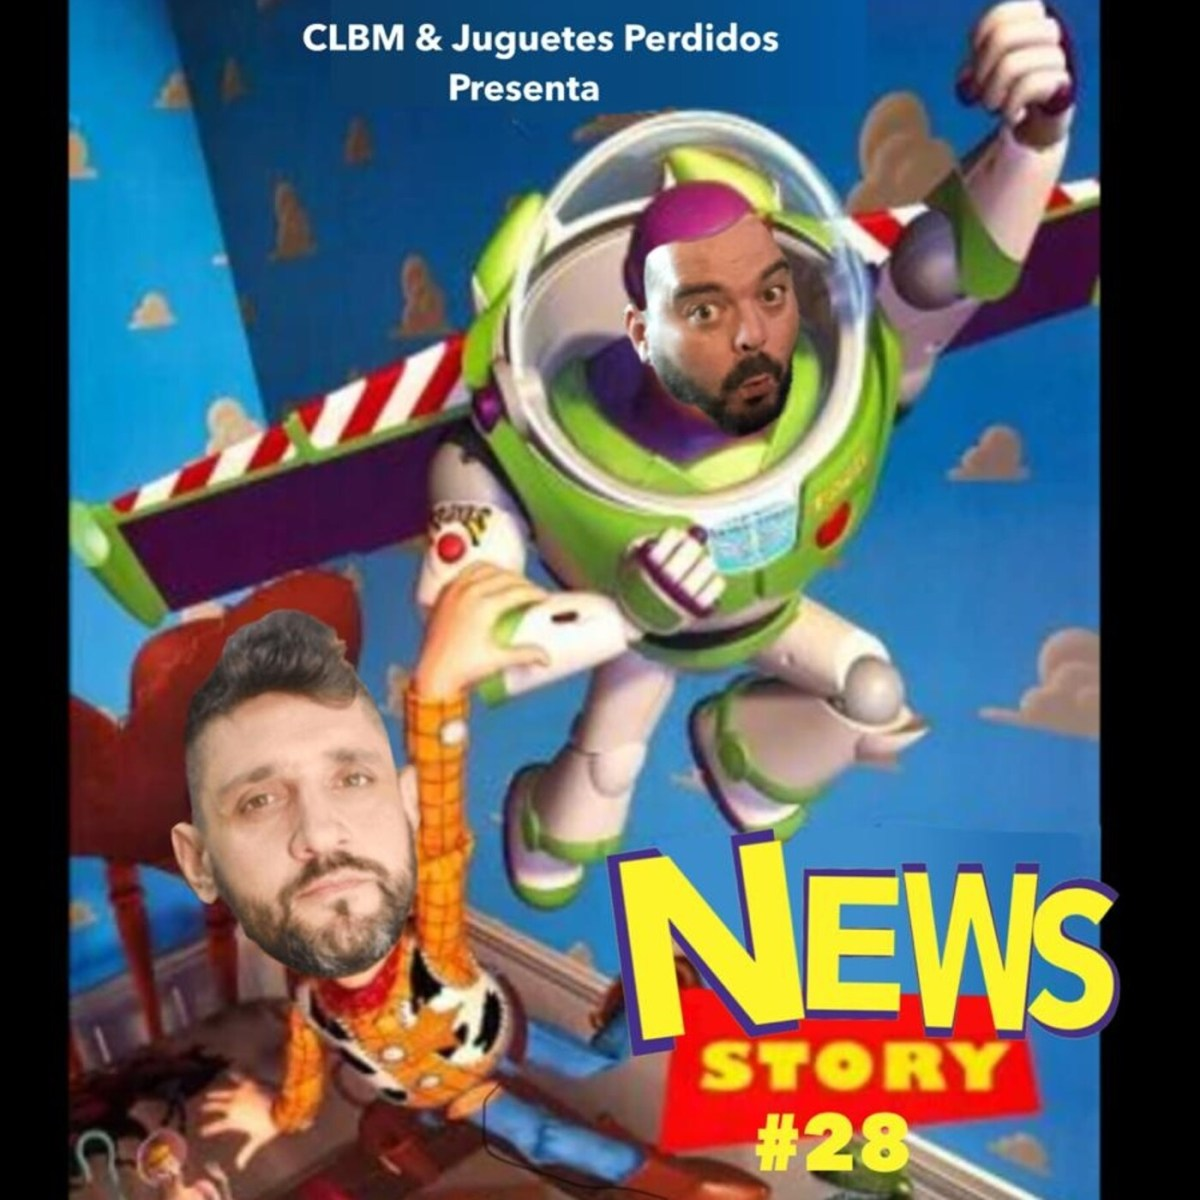 "CLBM NEWS #28 Juguetes Perdidos (Ricardo ""Semilla"" Aftyka)"